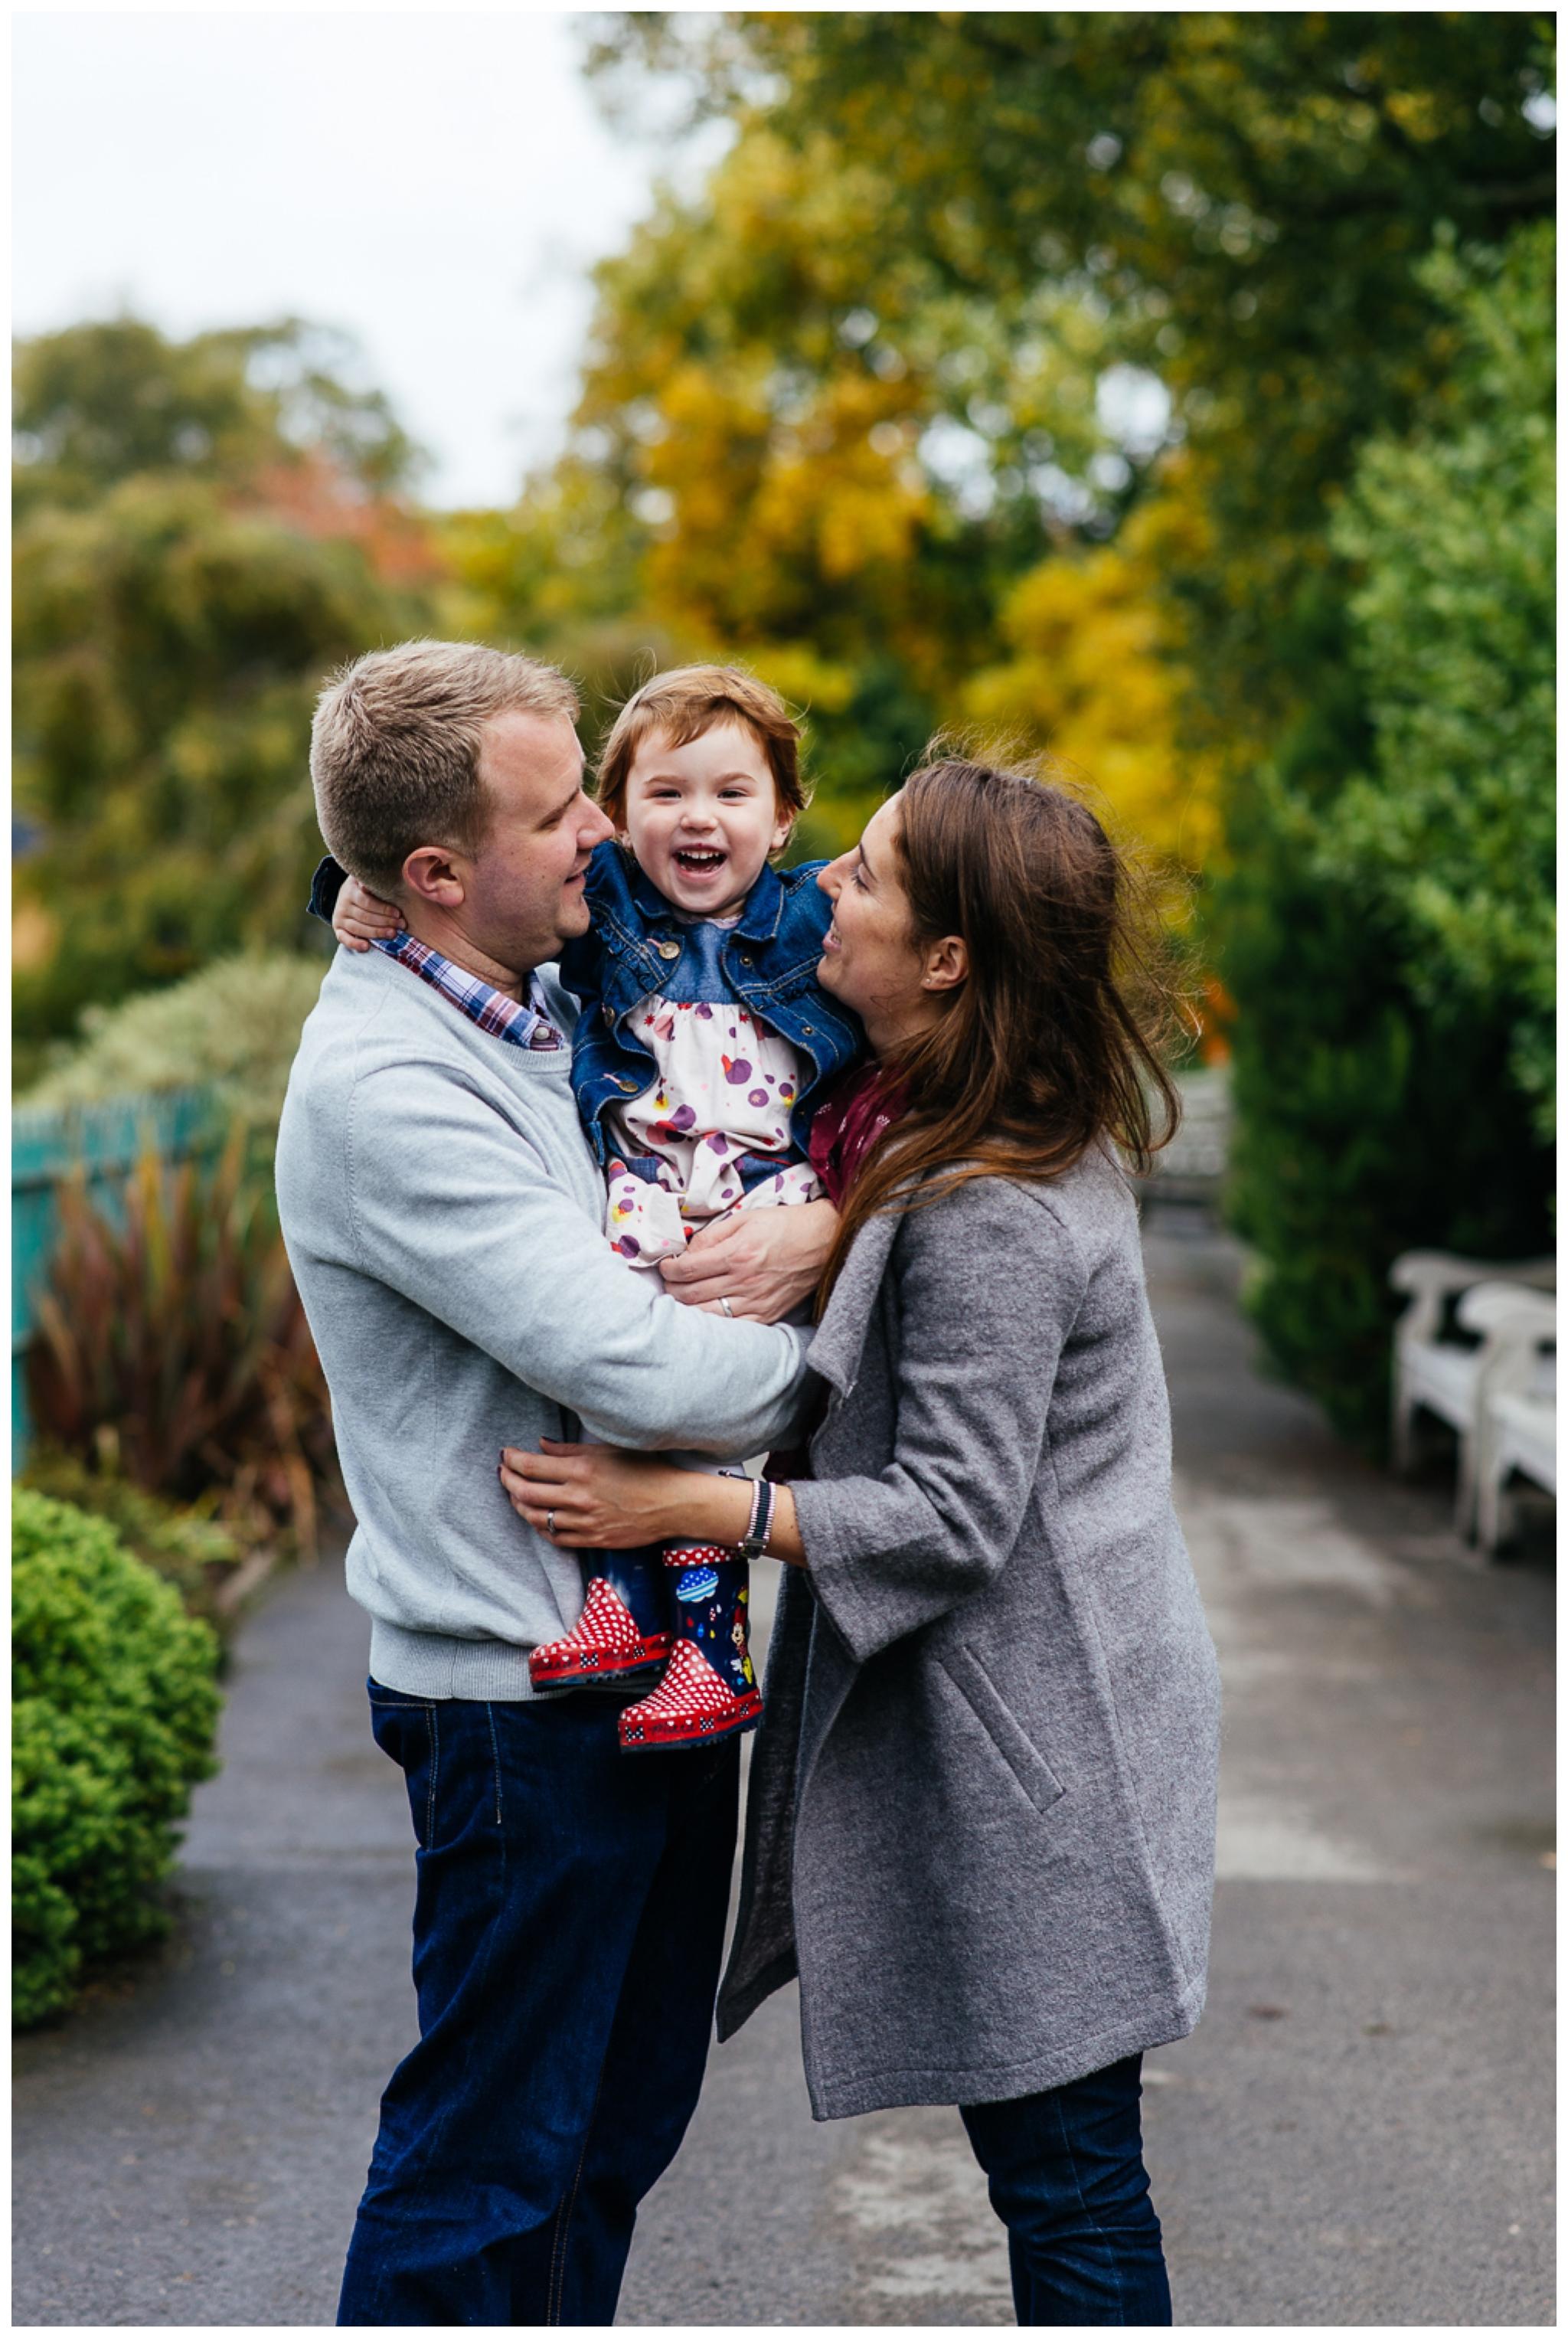 Autumn-family-portraits-birmingham-photographer_0034.jpg